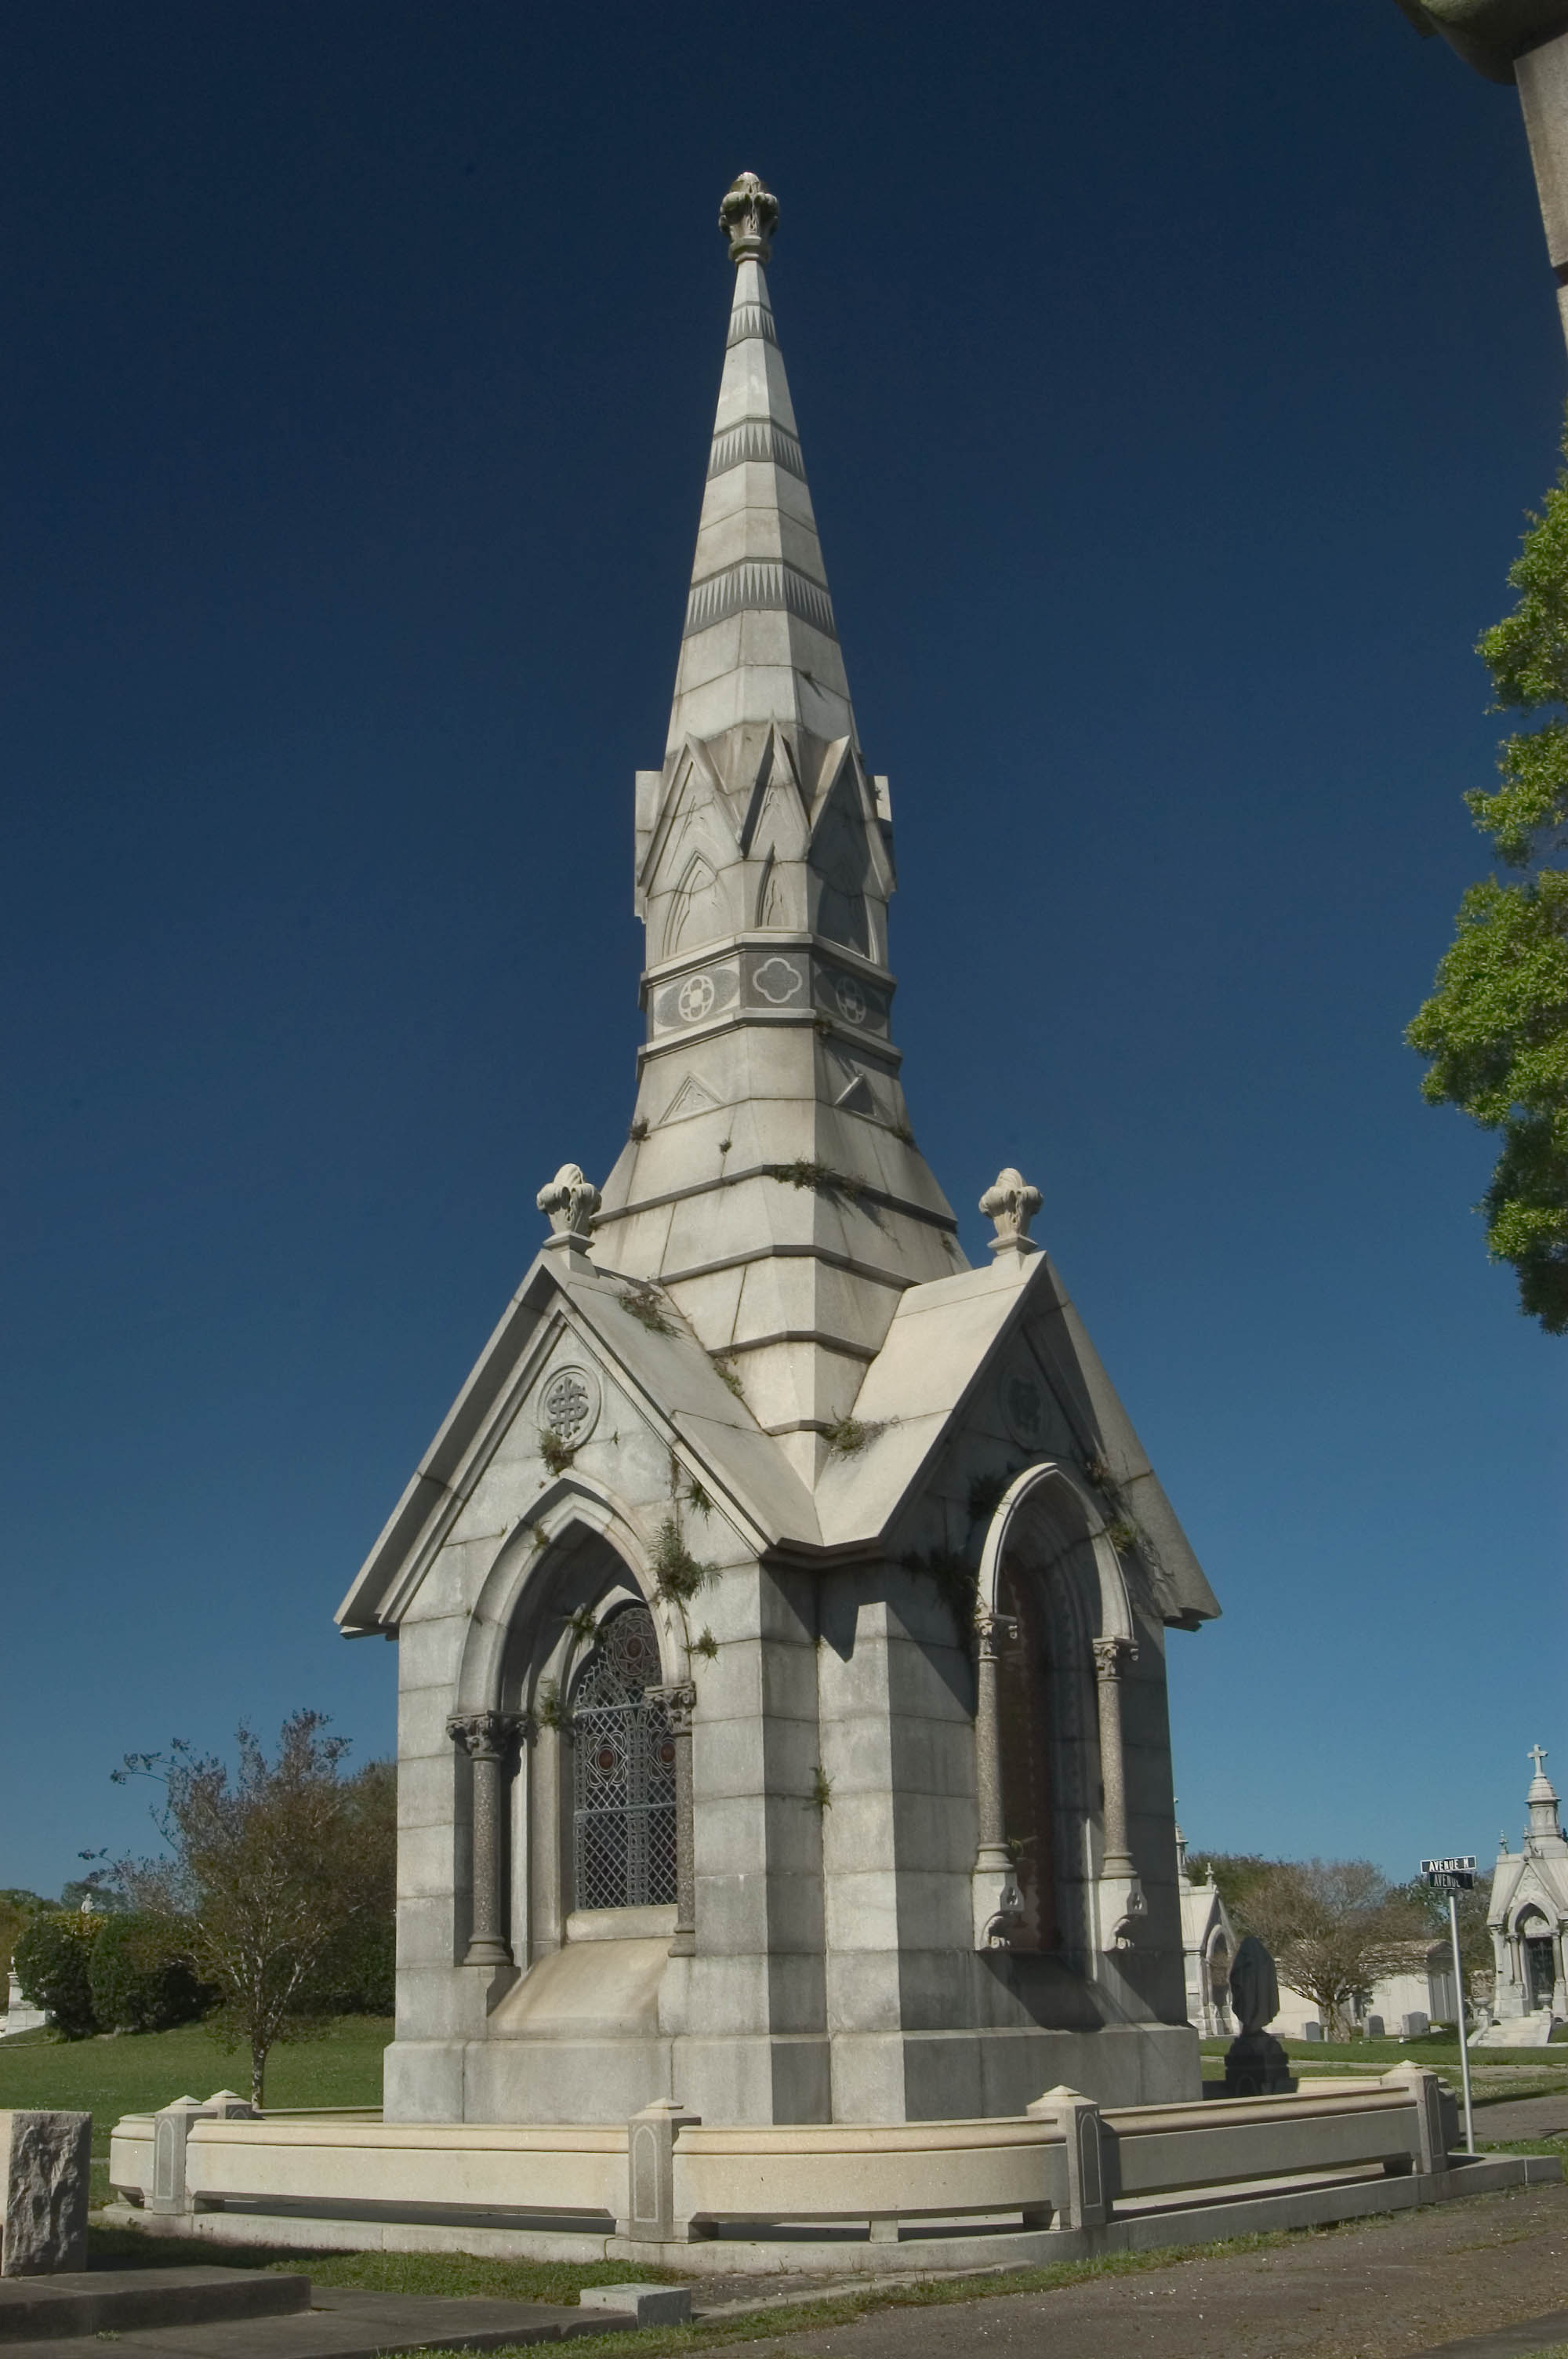 Photo 441 22 David C Mccann Mausoleum In Metairie Cemetery New Orleans Louisiana